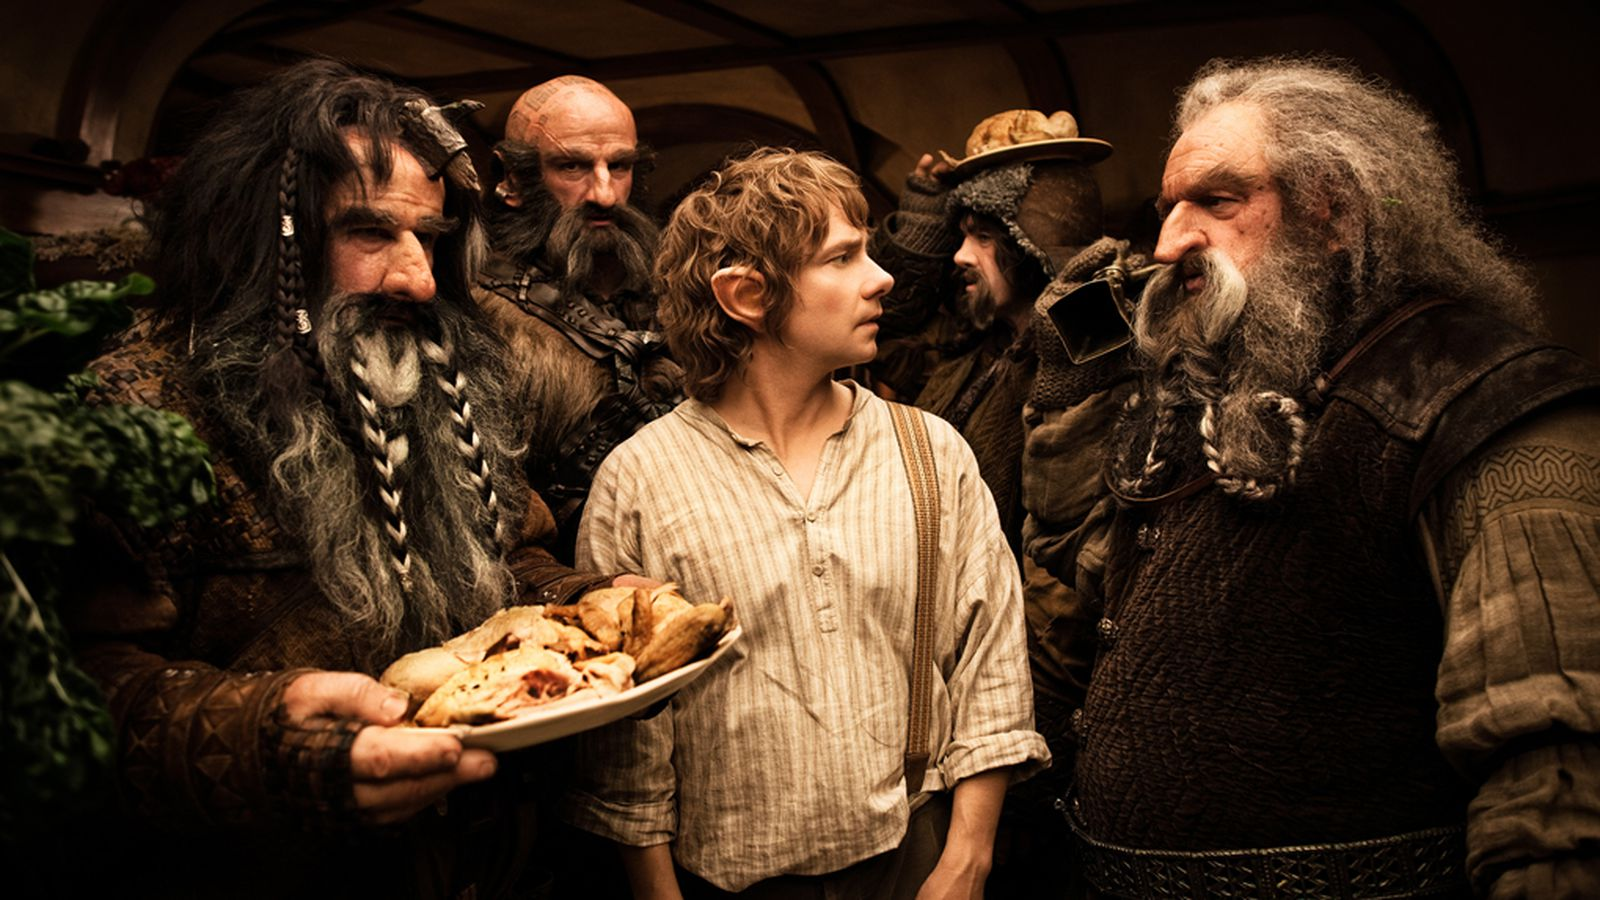 The Hobbit scene